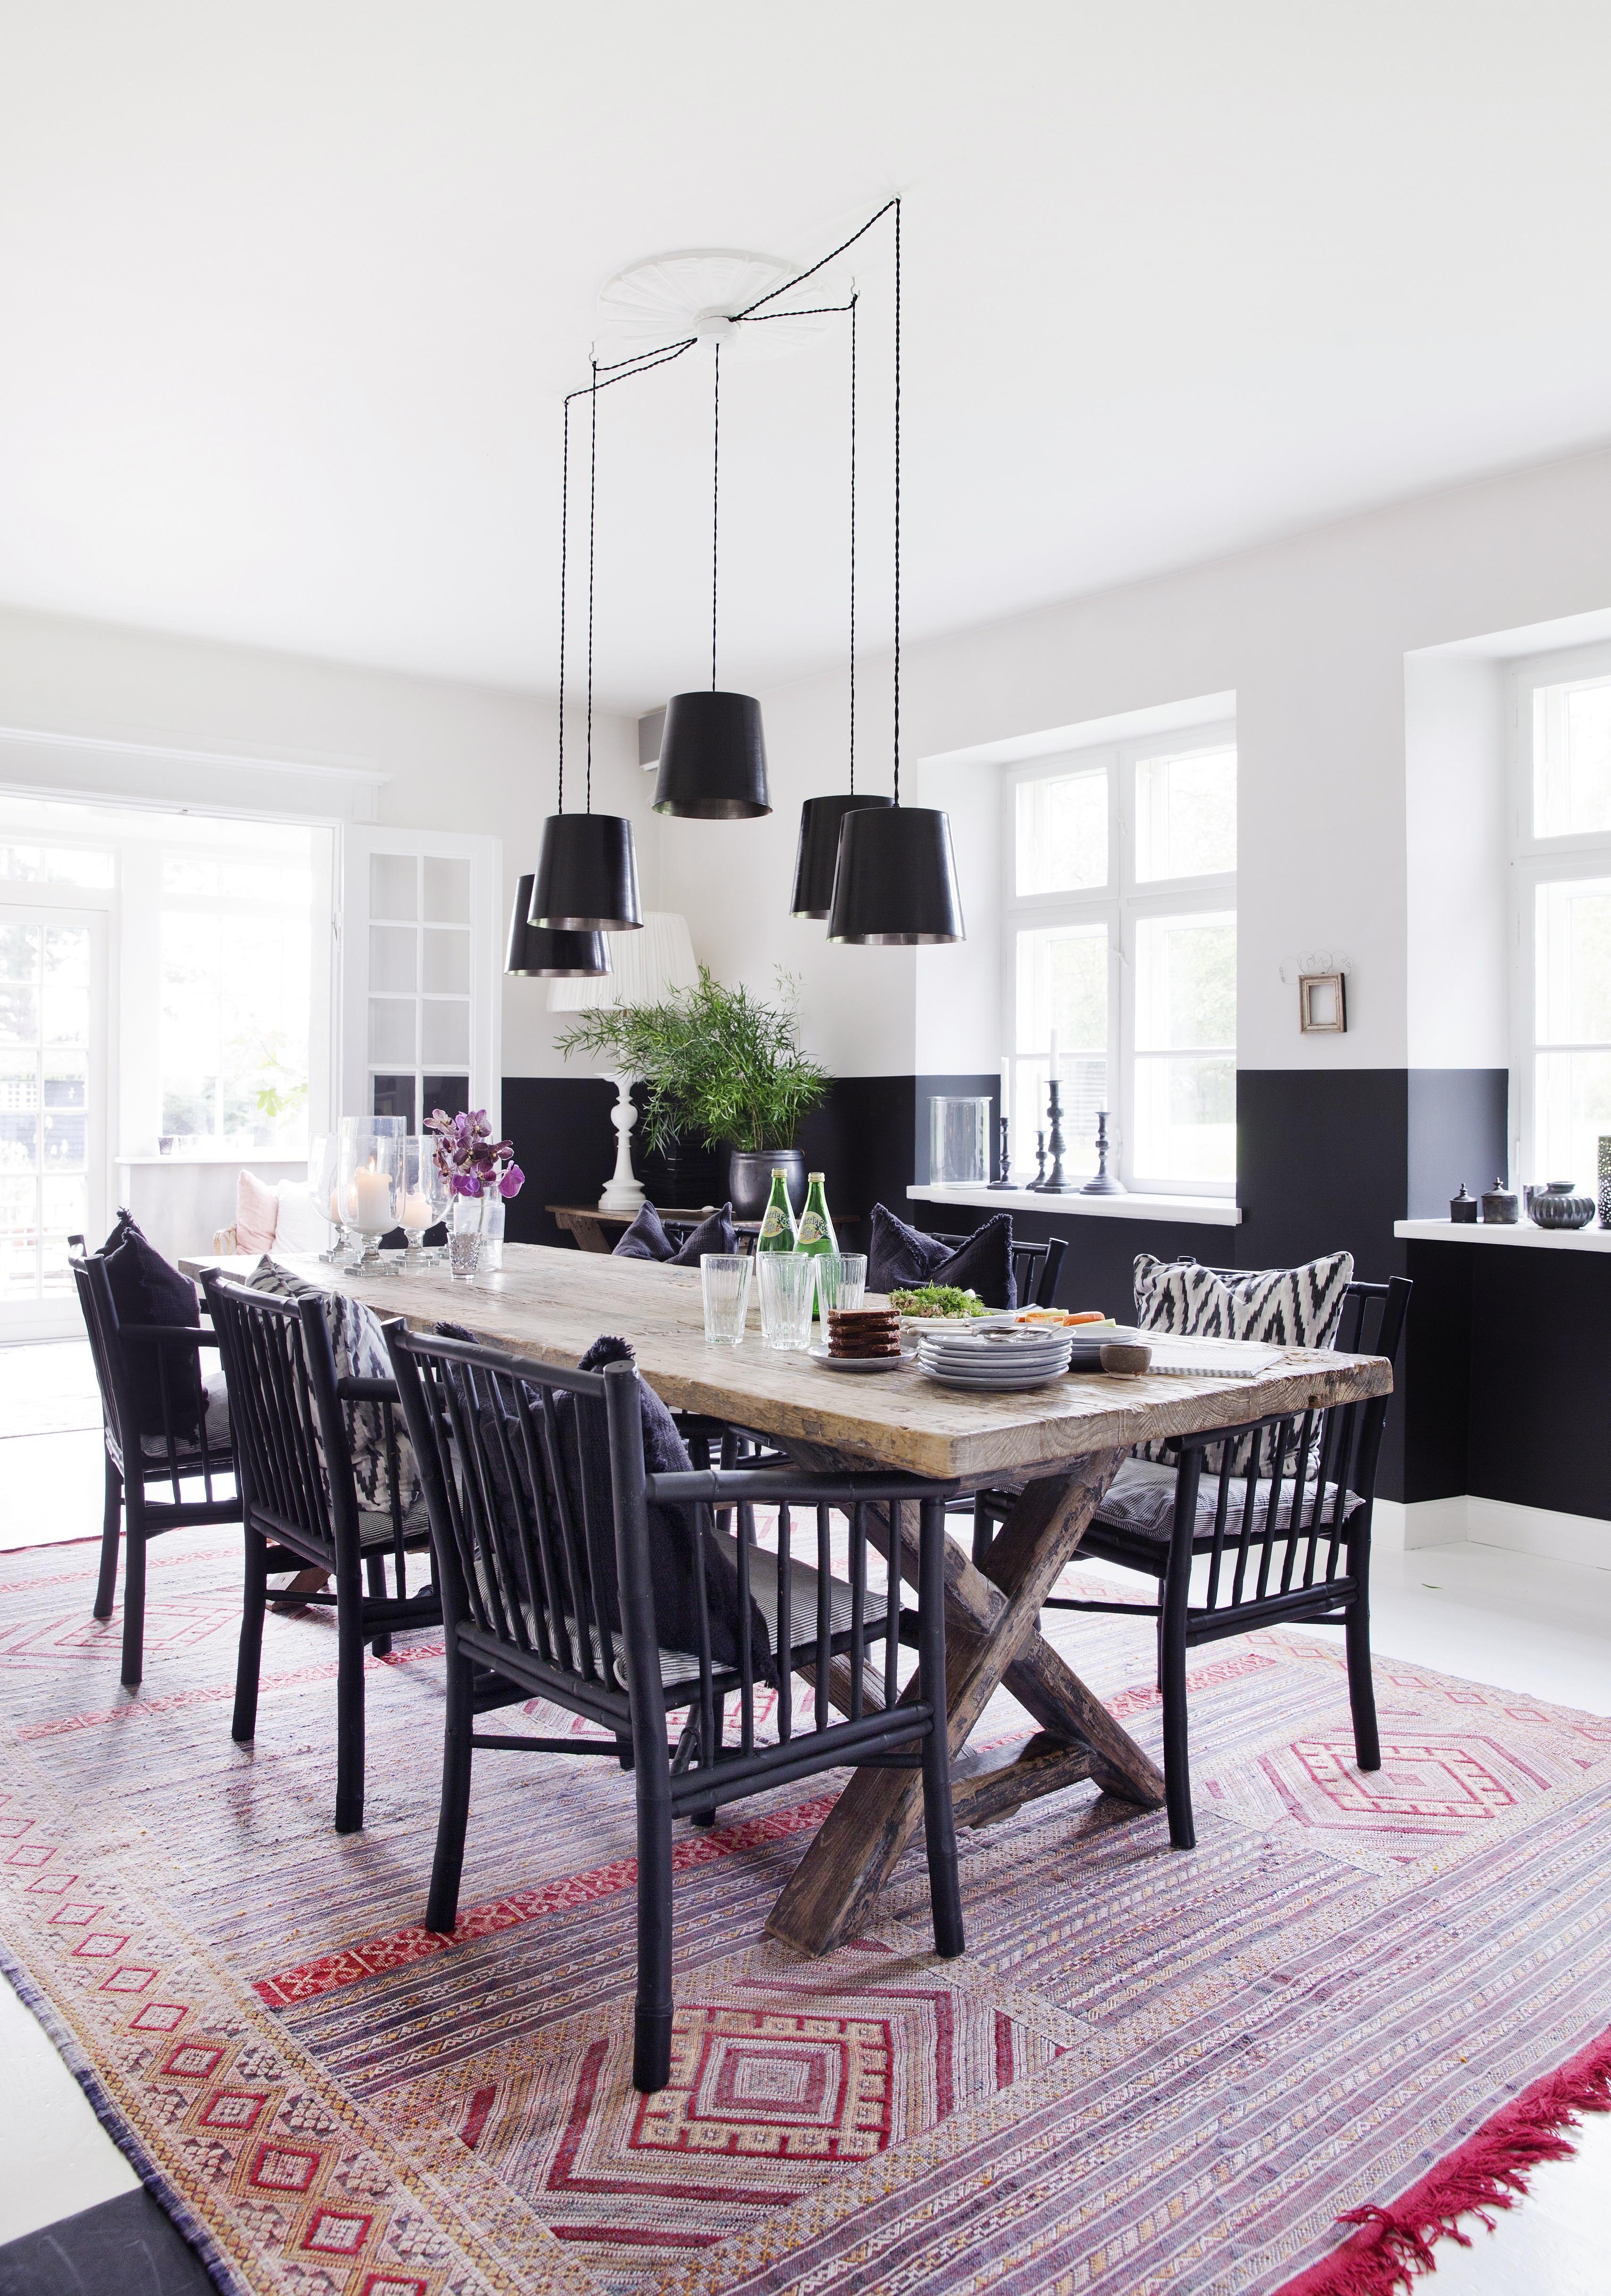 hjemme hos tine k tine kjeldsen 39 s home tinekhome. Black Bedroom Furniture Sets. Home Design Ideas